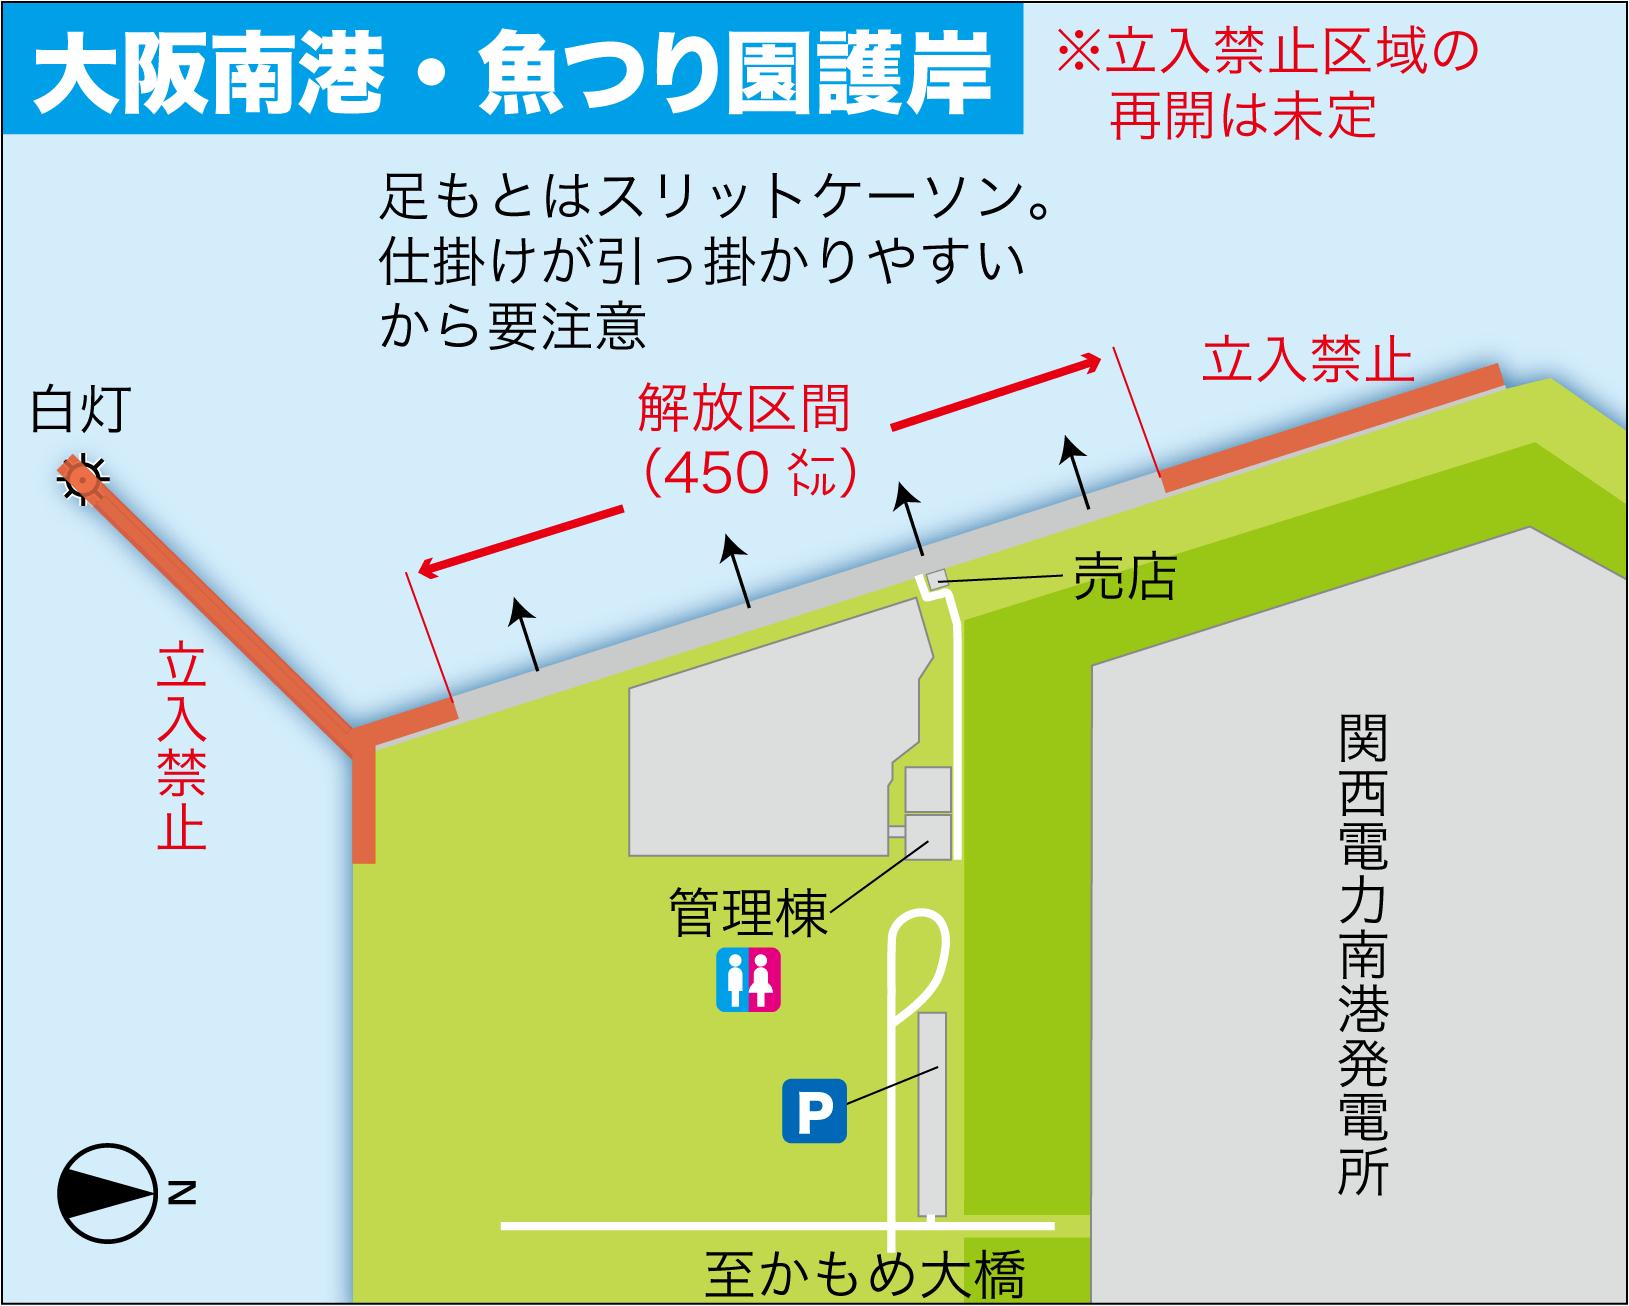 大阪南港魚つり園護岸復旧